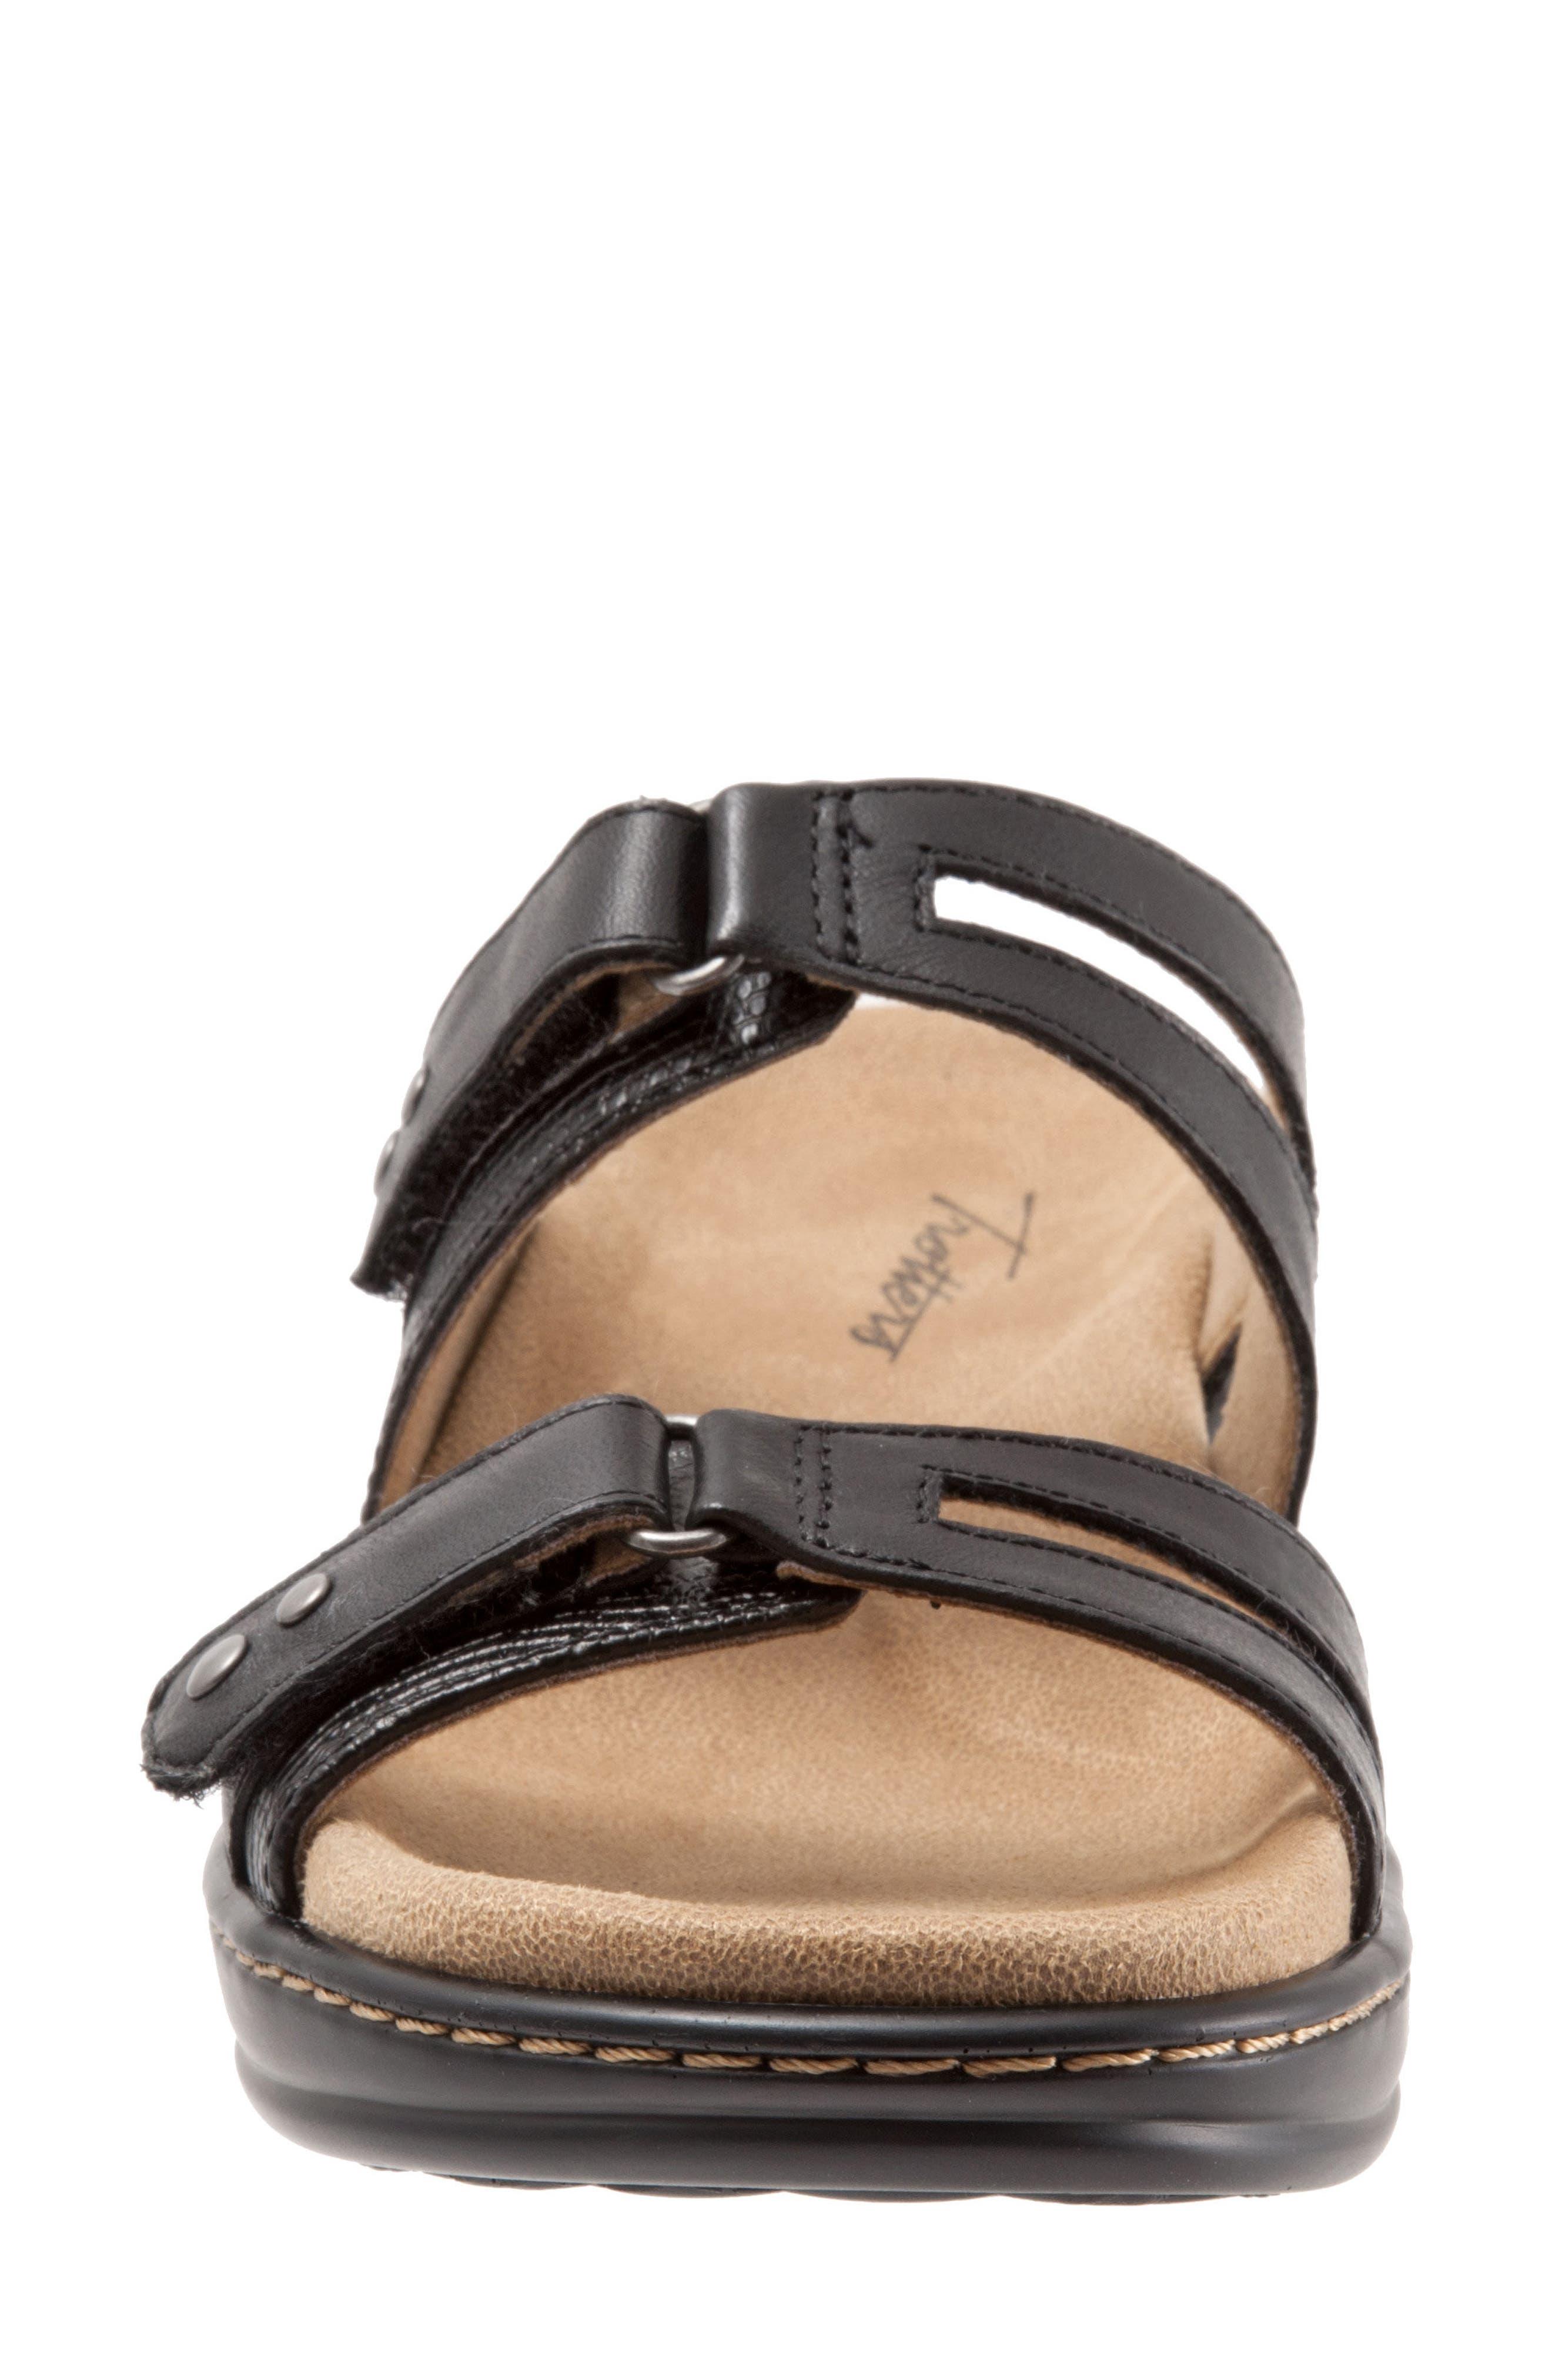 Neiman Sandal,                             Alternate thumbnail 4, color,                             Black Leather